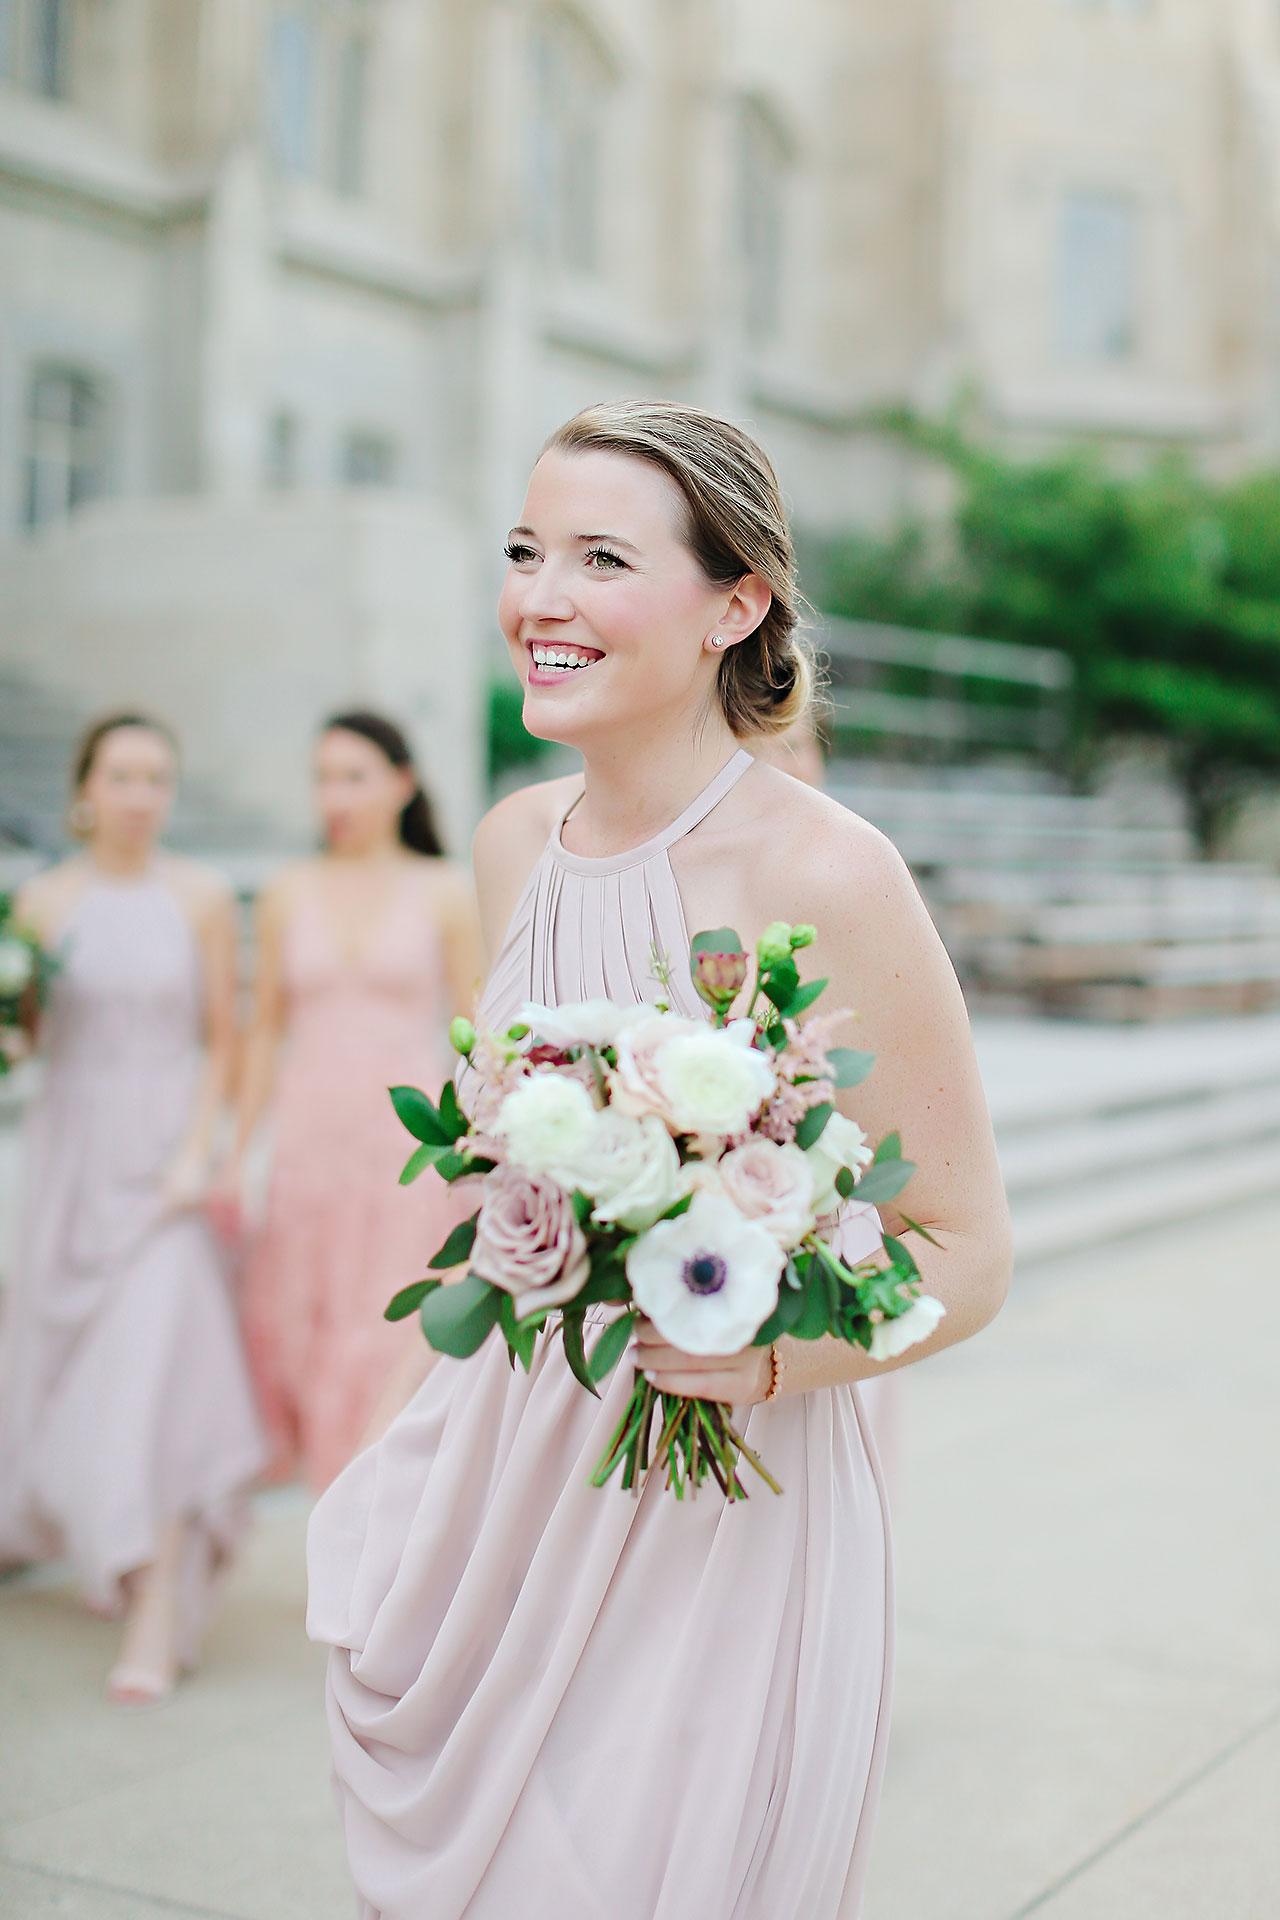 Molly Declan Scottish Rite Indianapolis Wedding 145